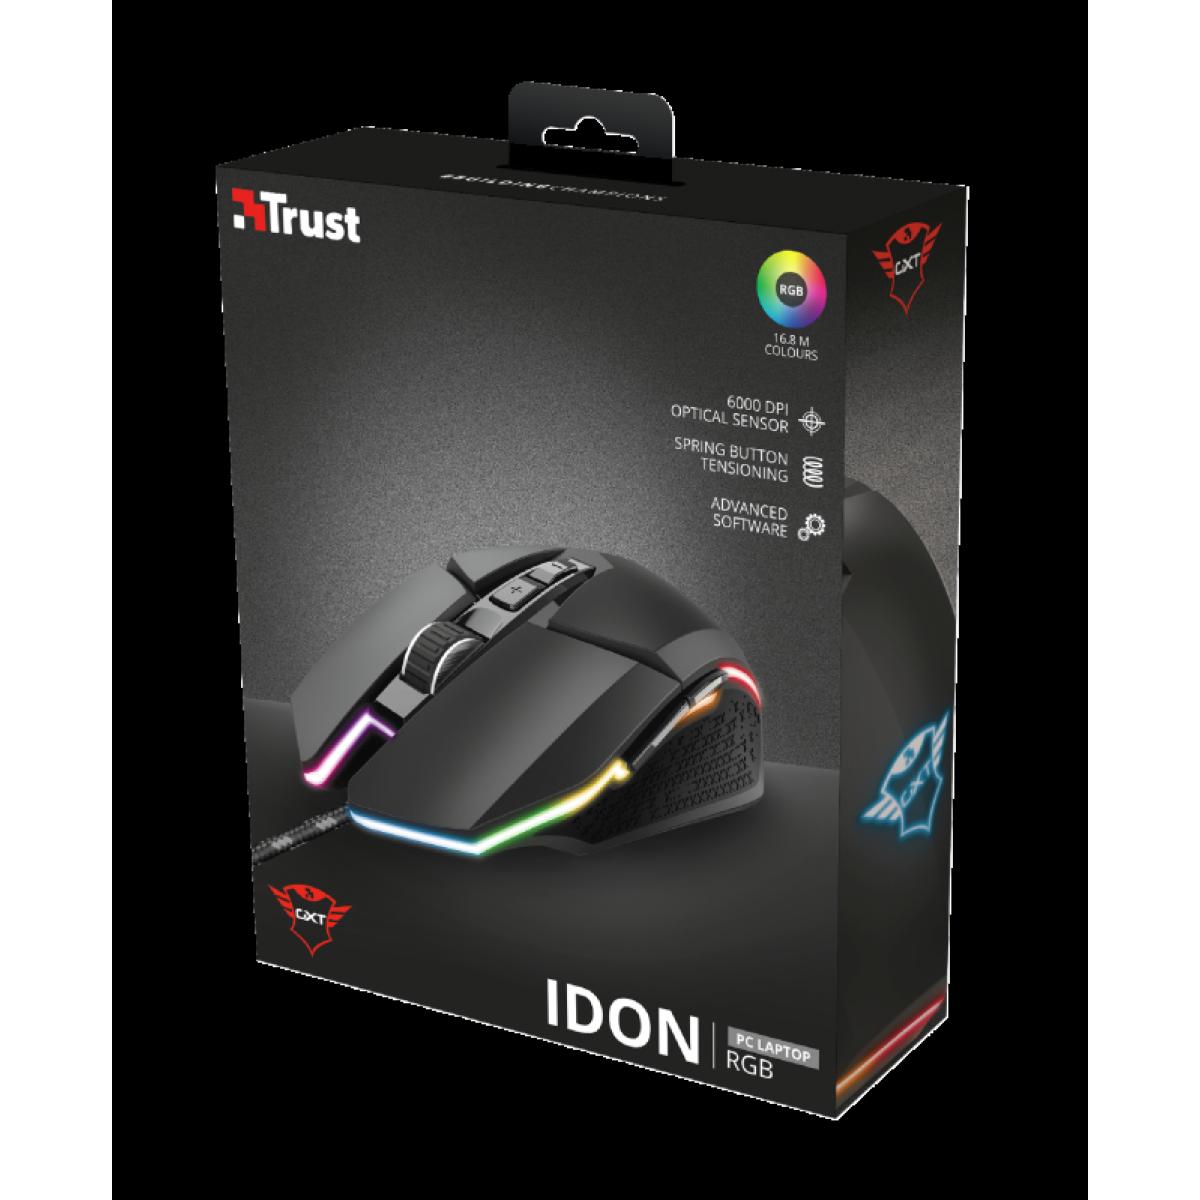 Mouse Gamer, Trust, GXT 950 IDON, RGB, 6000DPI